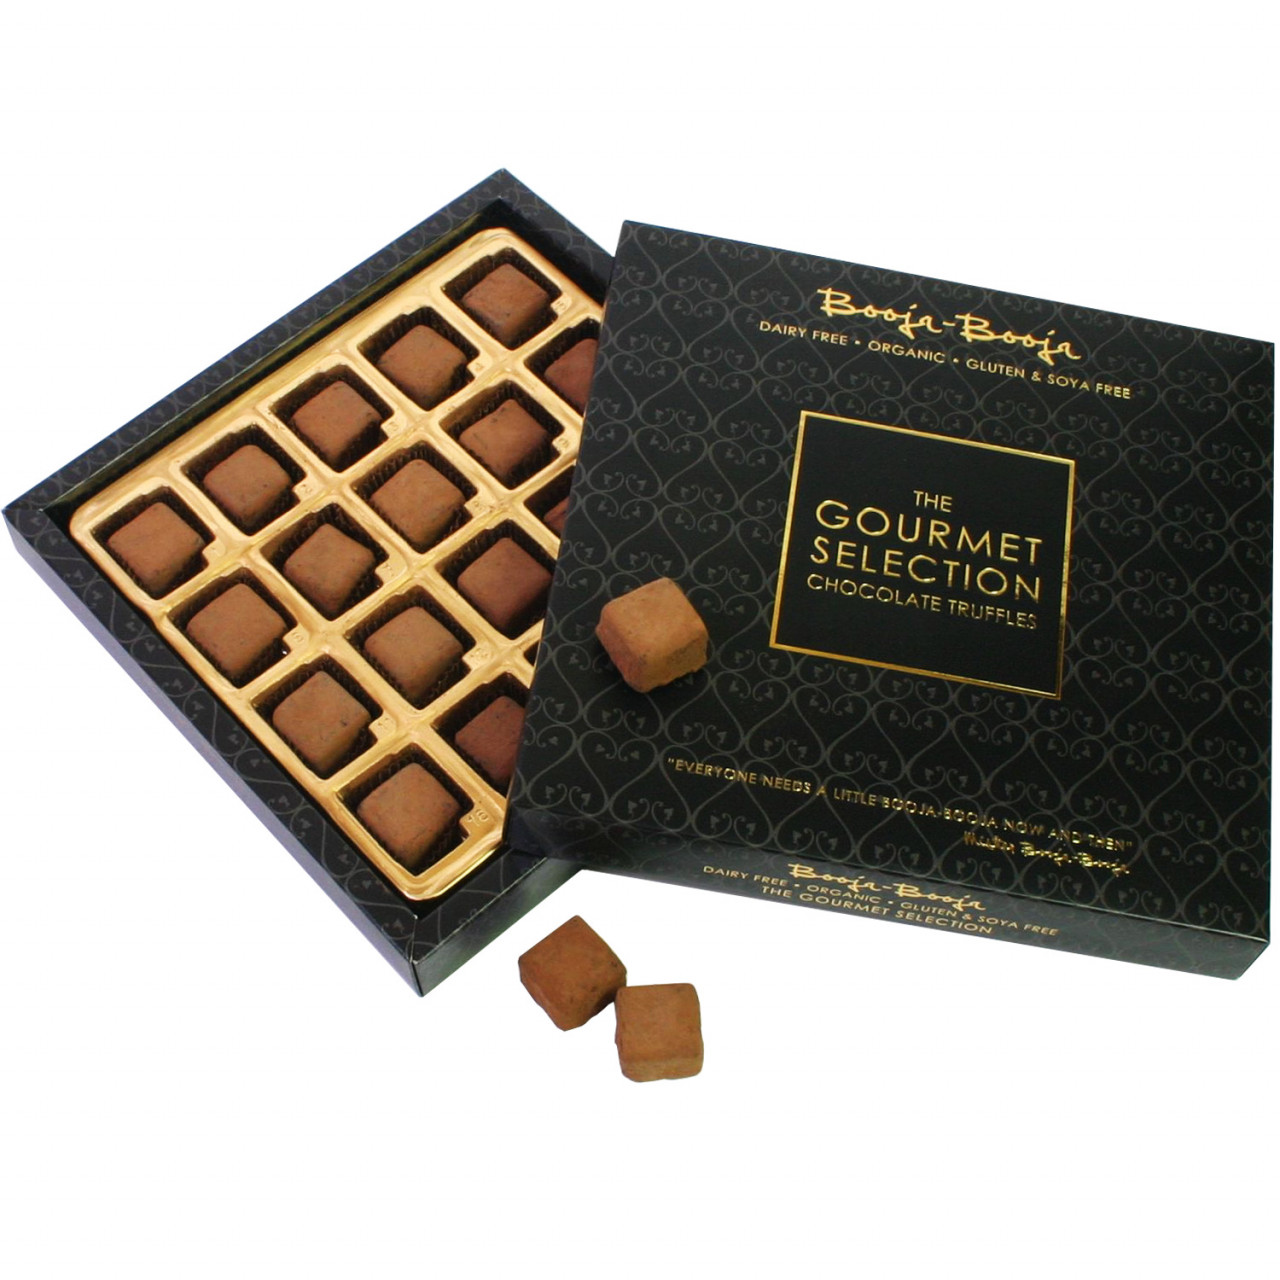 dunkle Schokolade, truffes, truffles, Pralinen, Haselnuss, Ingwer, Espresso, Bananen Toffee, Champagner Trüffel                                                                                          - Pralines, Chocolat ans protéines de lait, chocolate sans huile de palme, chocolat sans gluten, chocolat sans lactose, chocolat sans soja, chocolat végétalien, Angleterre, chocolat anglais, Chocolat au caramel - Chocolats-De-Luxe